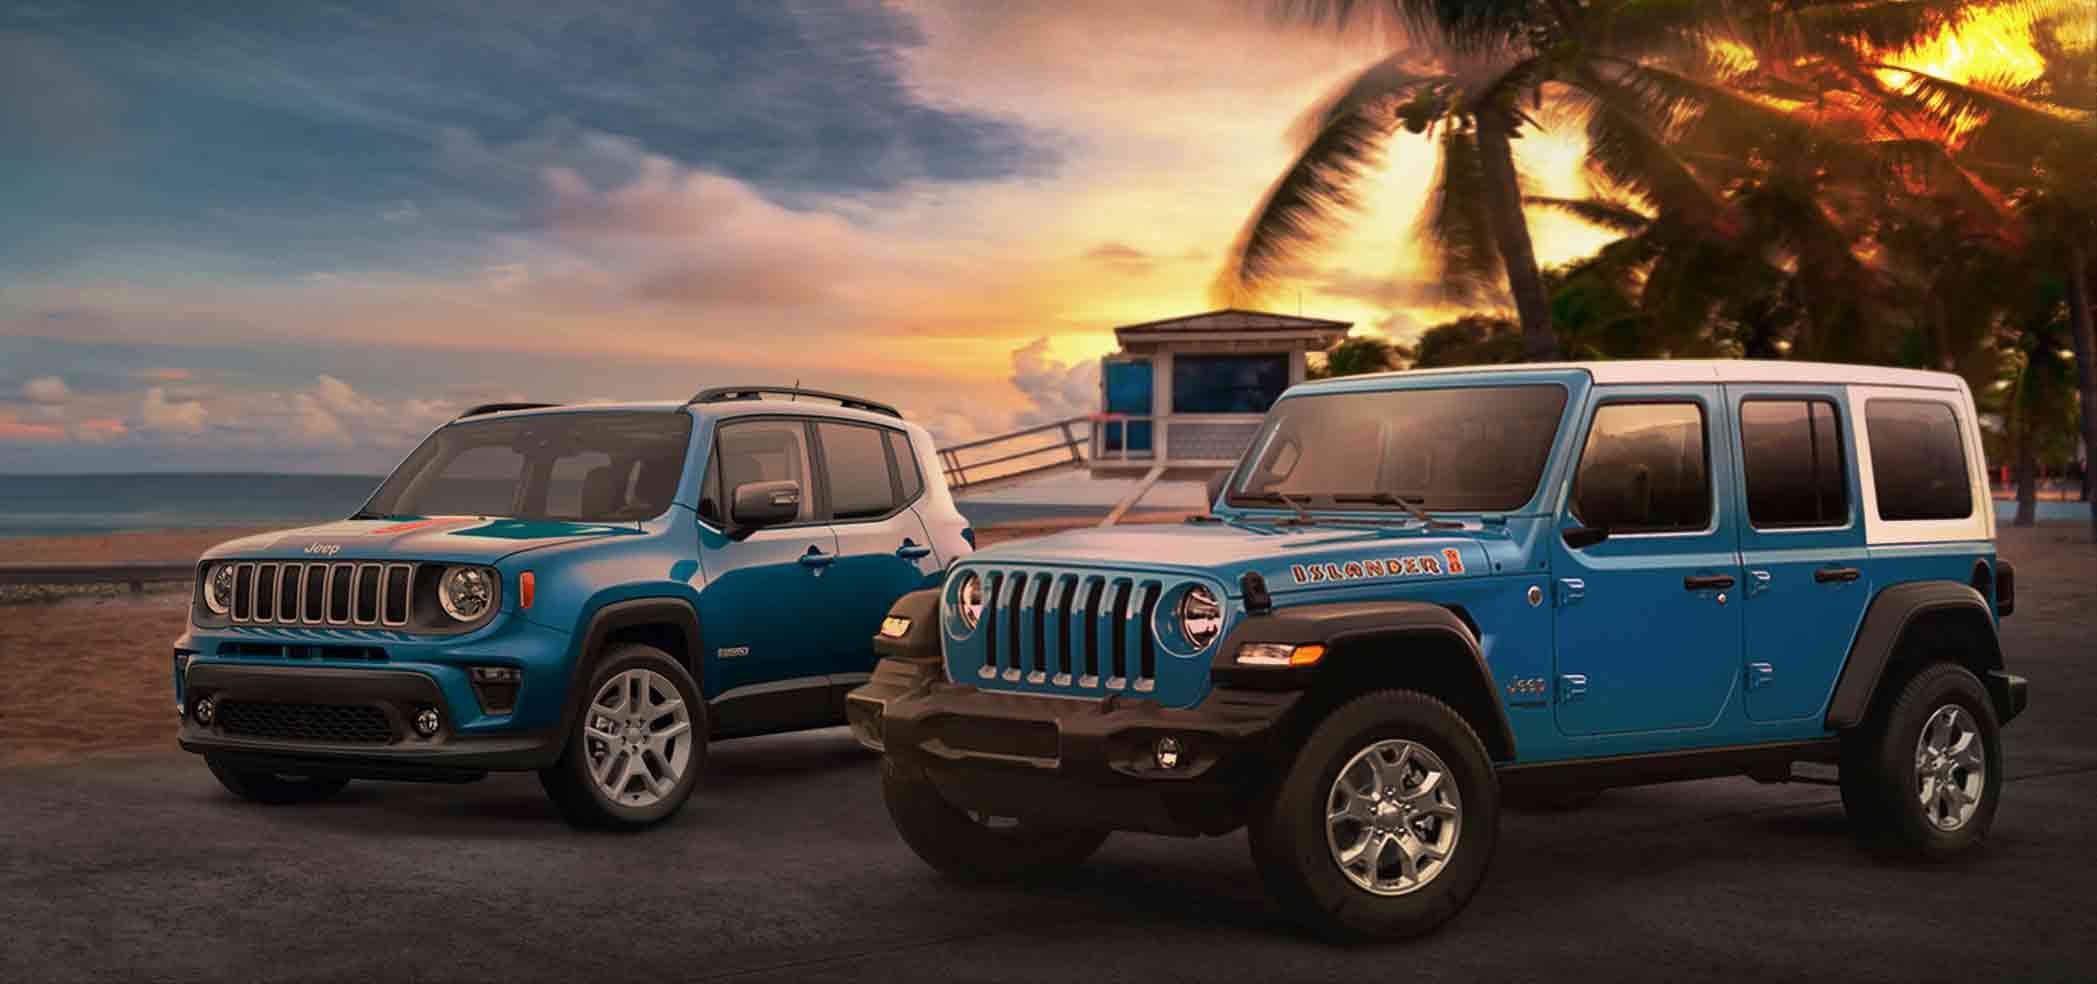 Jeep-Wrangler-Renegade-Islander-Trim